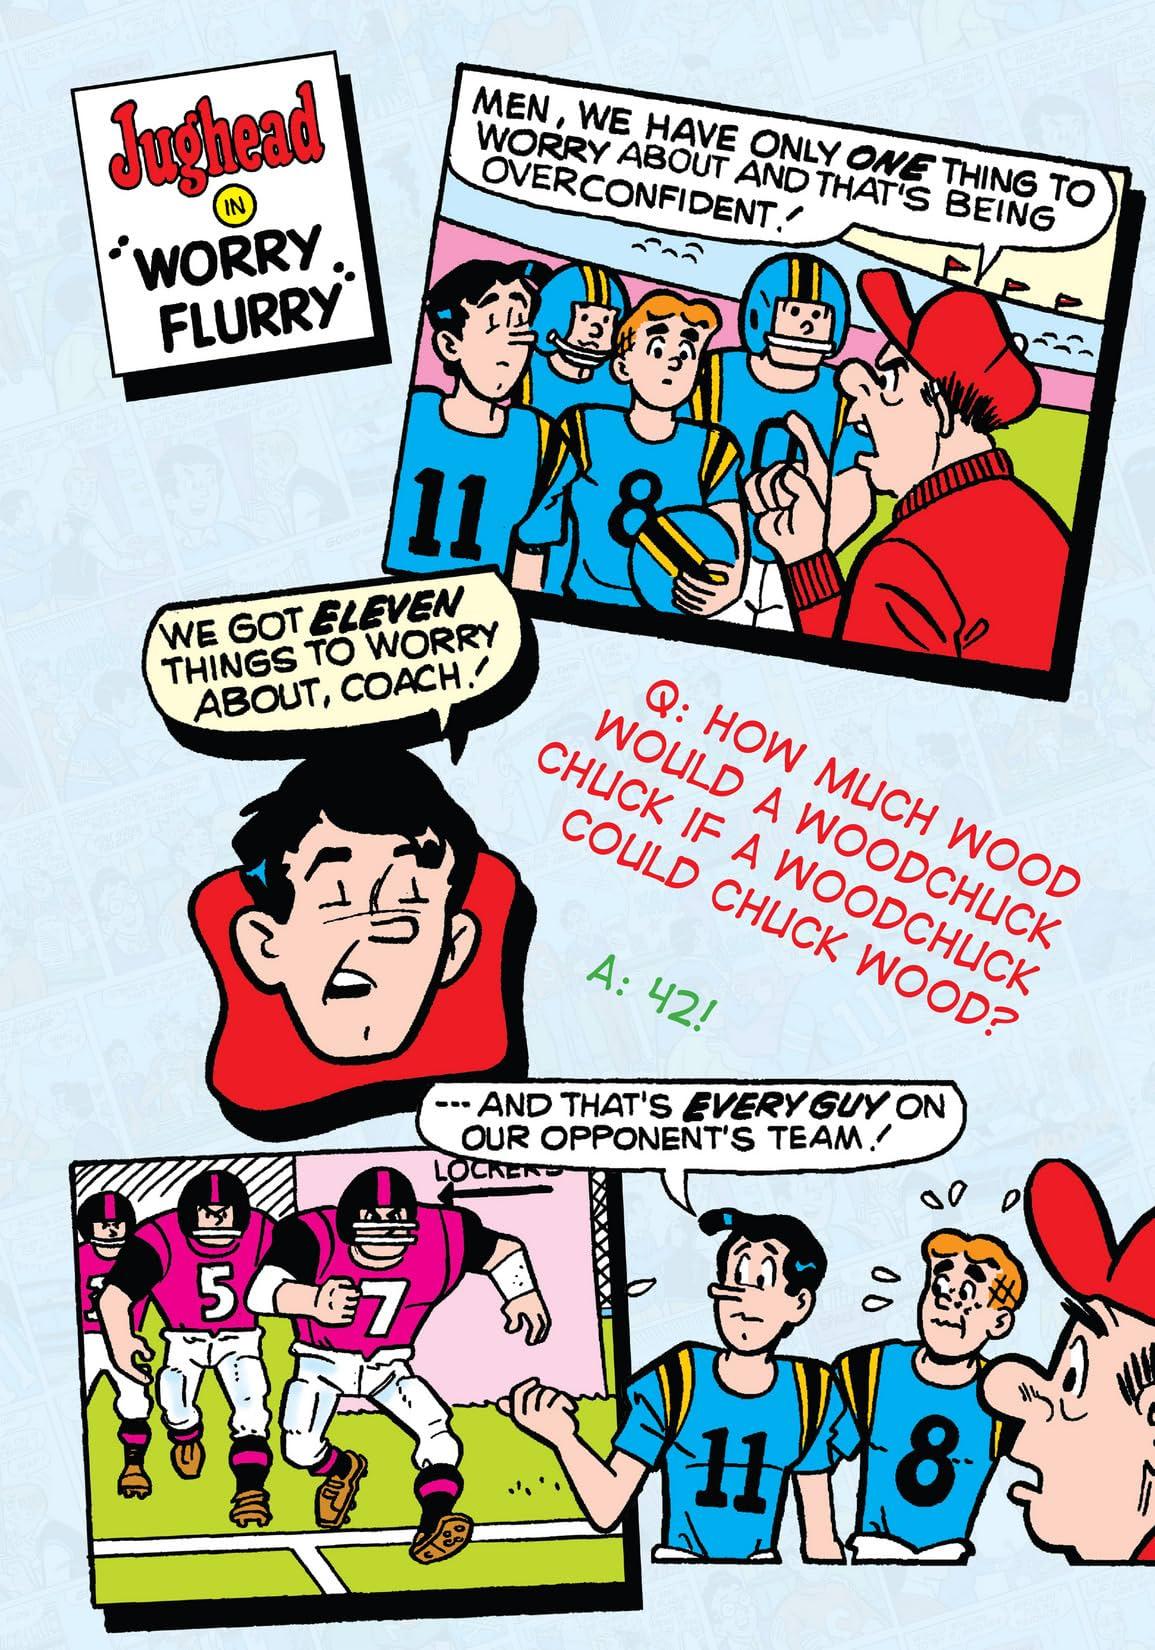 Archie's Funnier Joke Book Vol. 2